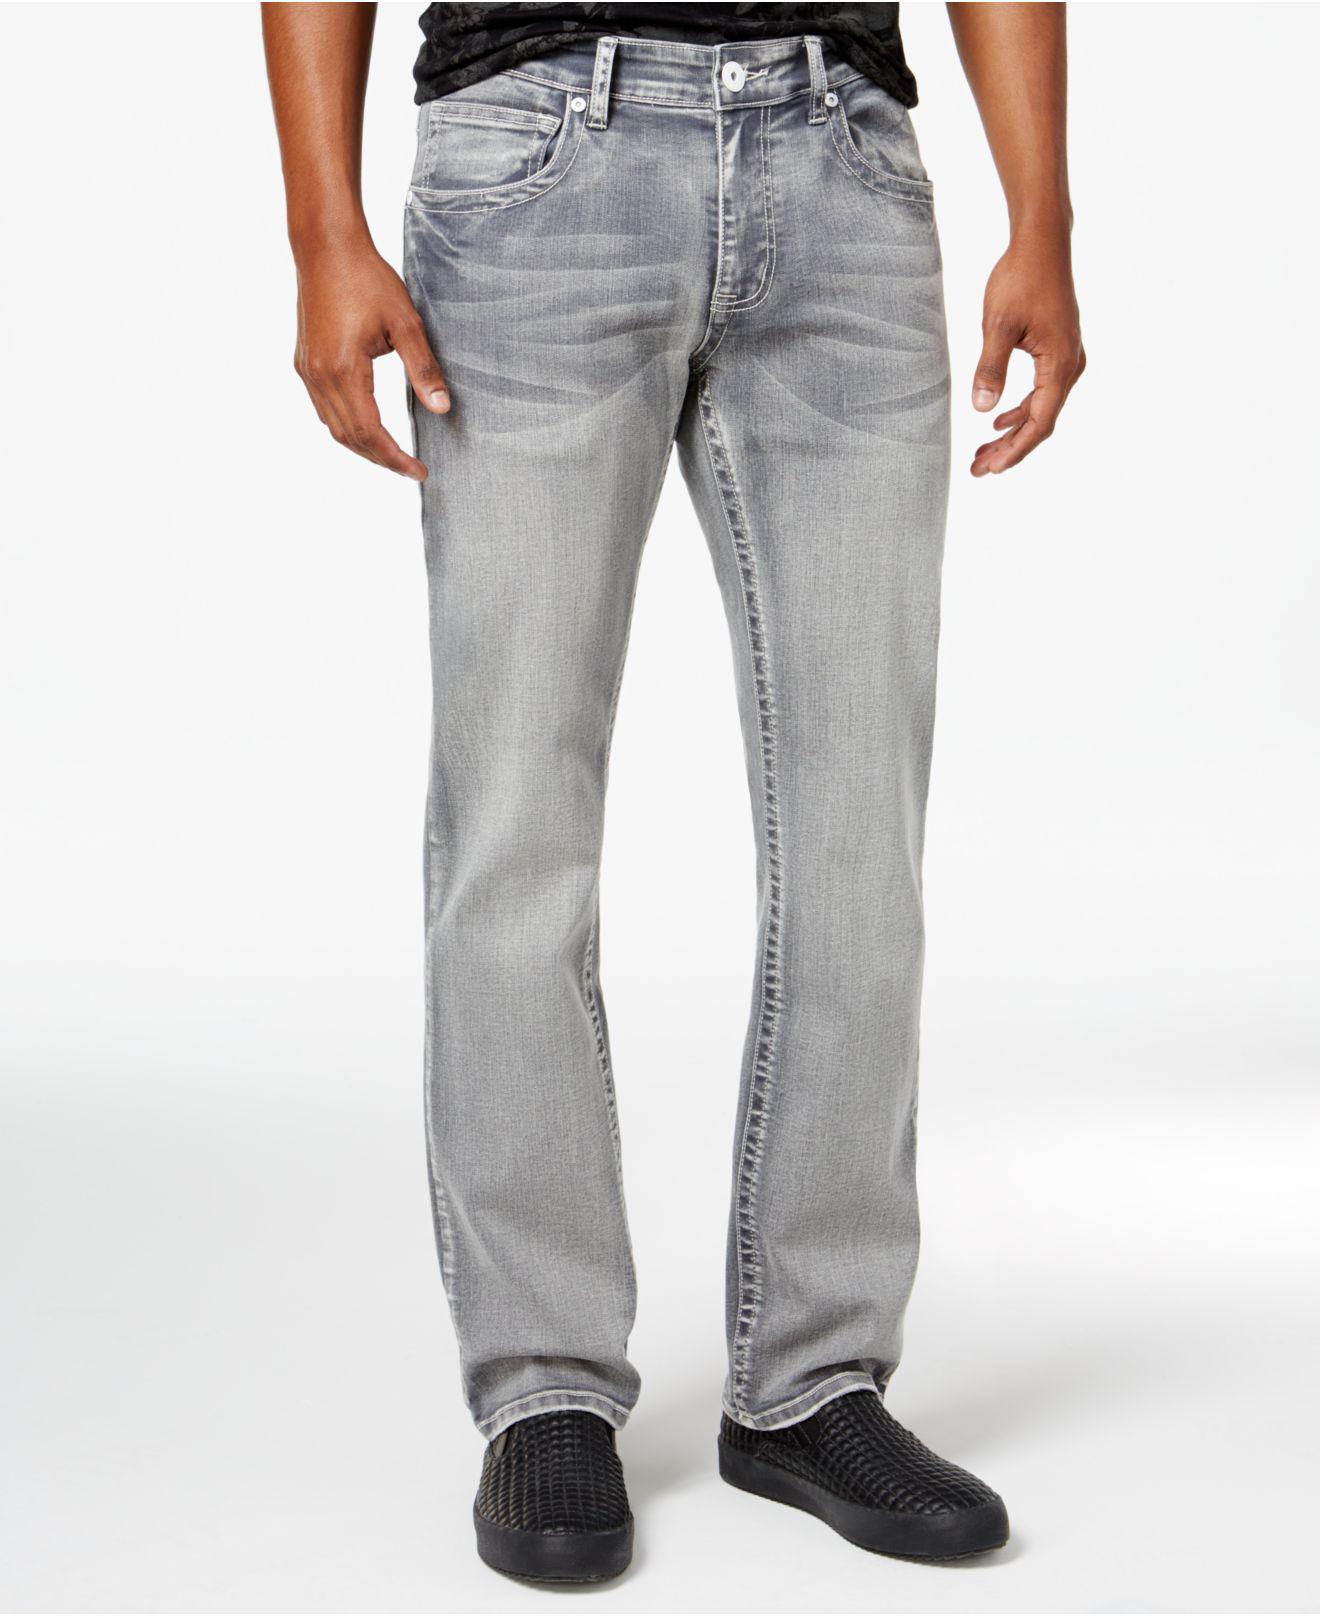 88e60b5dc1a4 Lyst - INC International Concepts Jeans